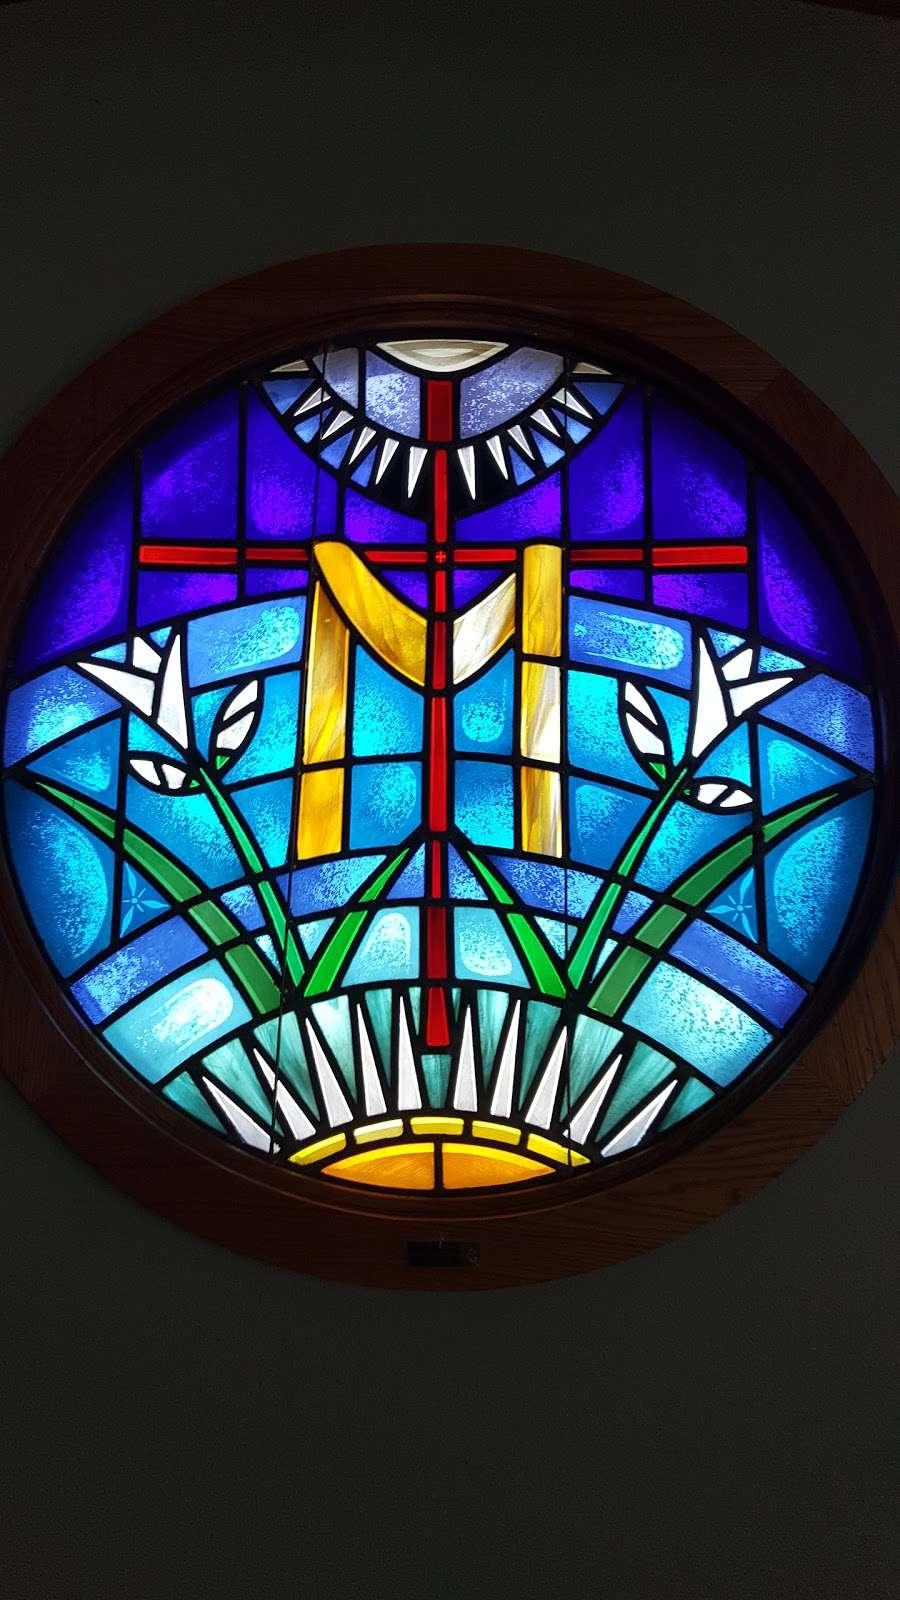 Resurrection Lutheran Church - church  | Photo 5 of 10 | Address: 12400 W Cold Spring Rd, New Berlin, WI 53151, USA | Phone: (262) 786-8880